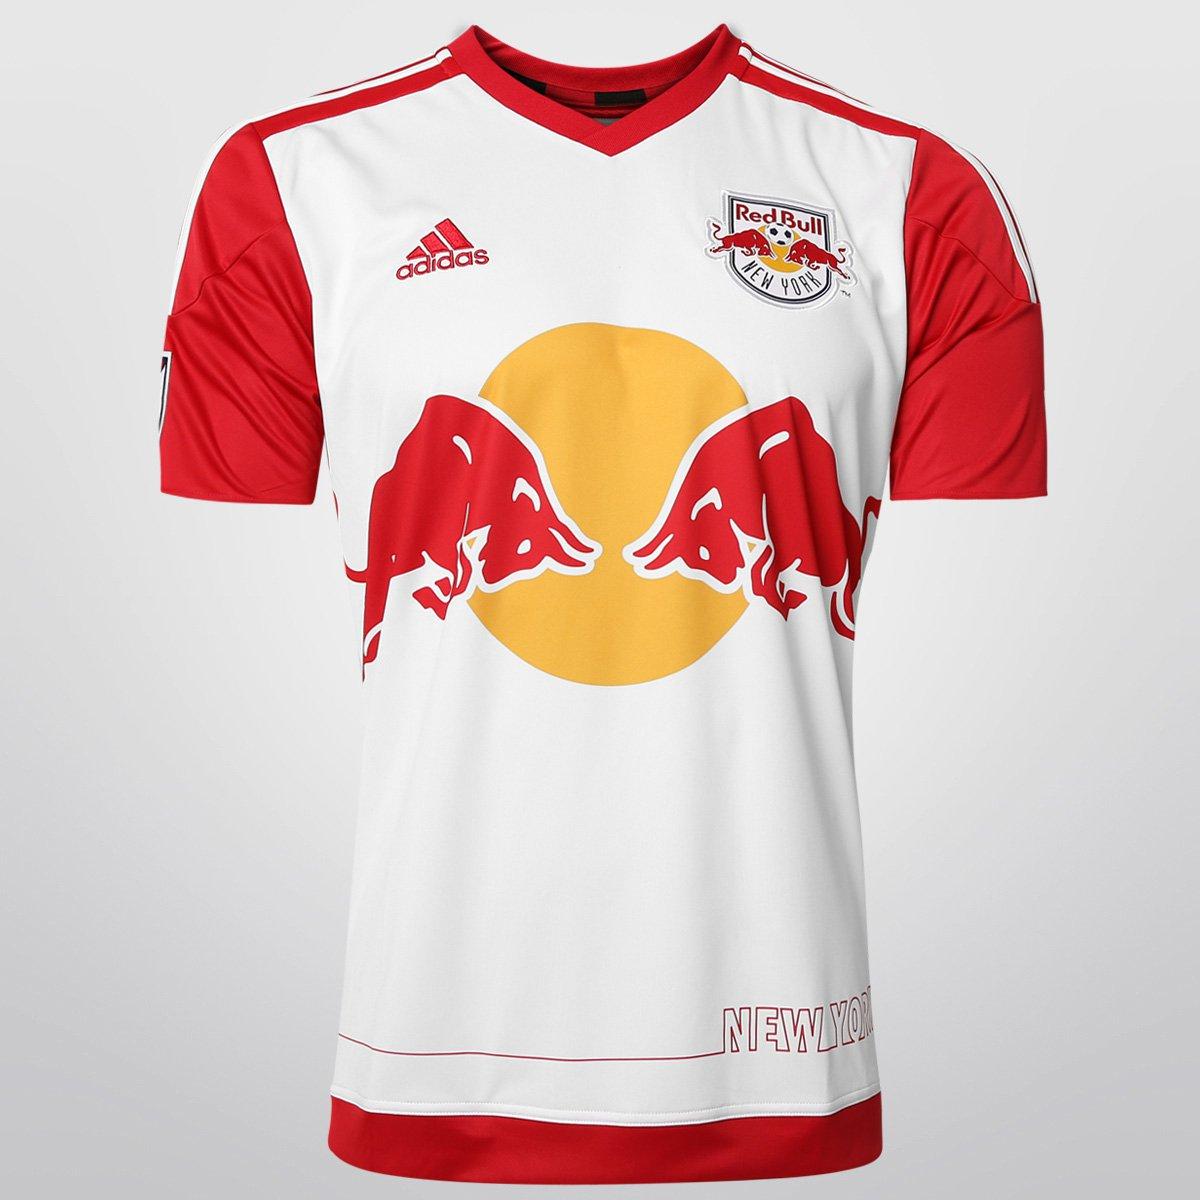 al límite salvar cobertura  Camisa Adidas Red Bull New York Home 15/16 s/nº   Netshoes